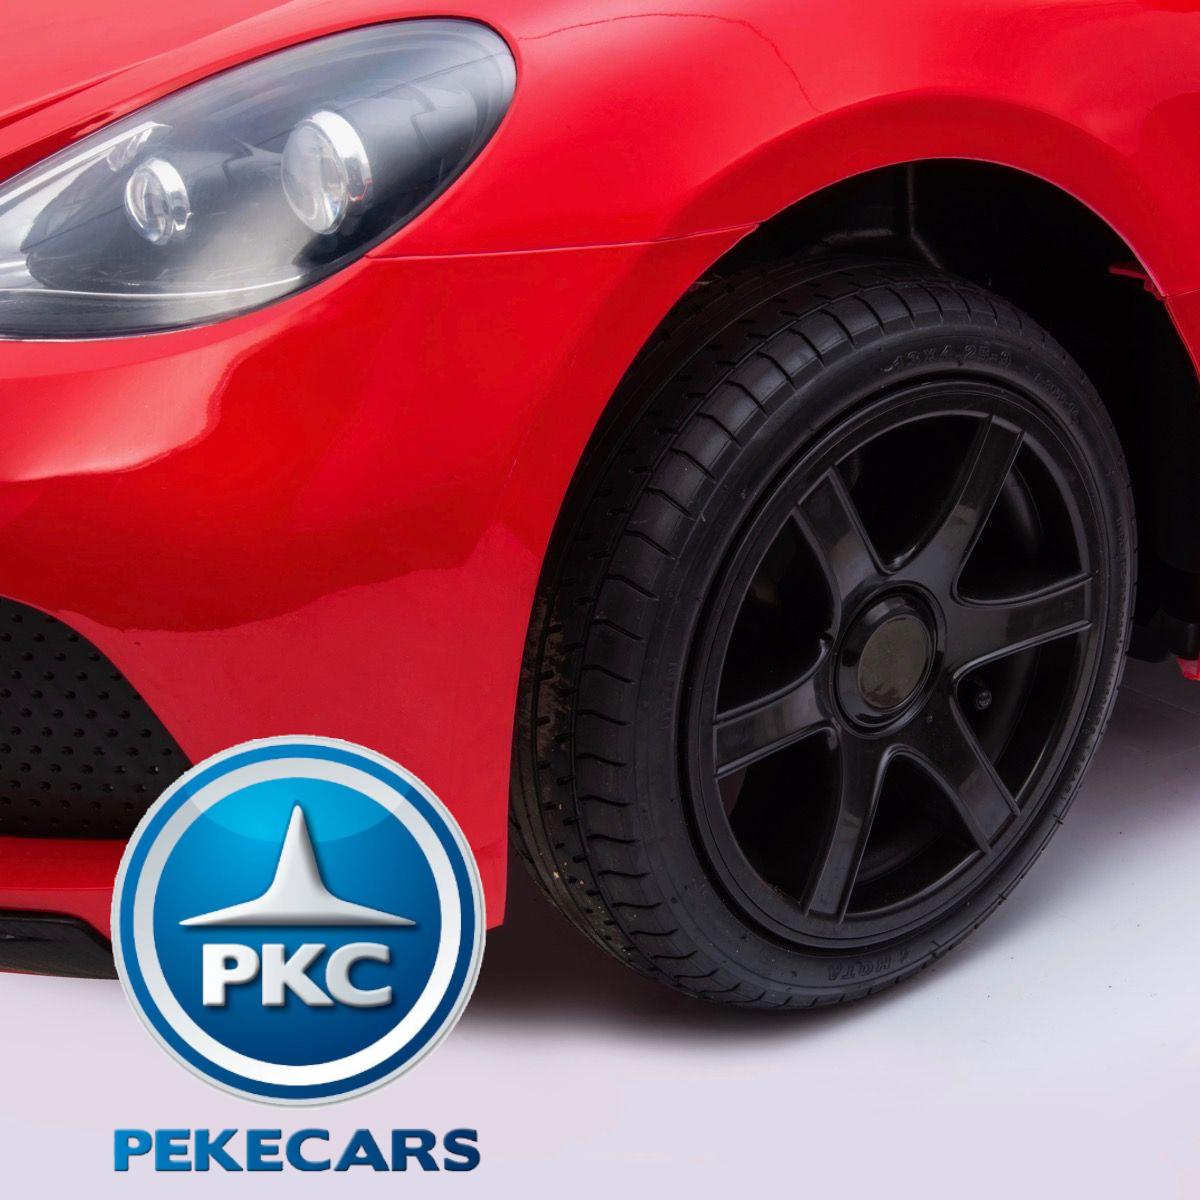 Deportivo Pekecars XL 24V Rojo - rueda del. izq.